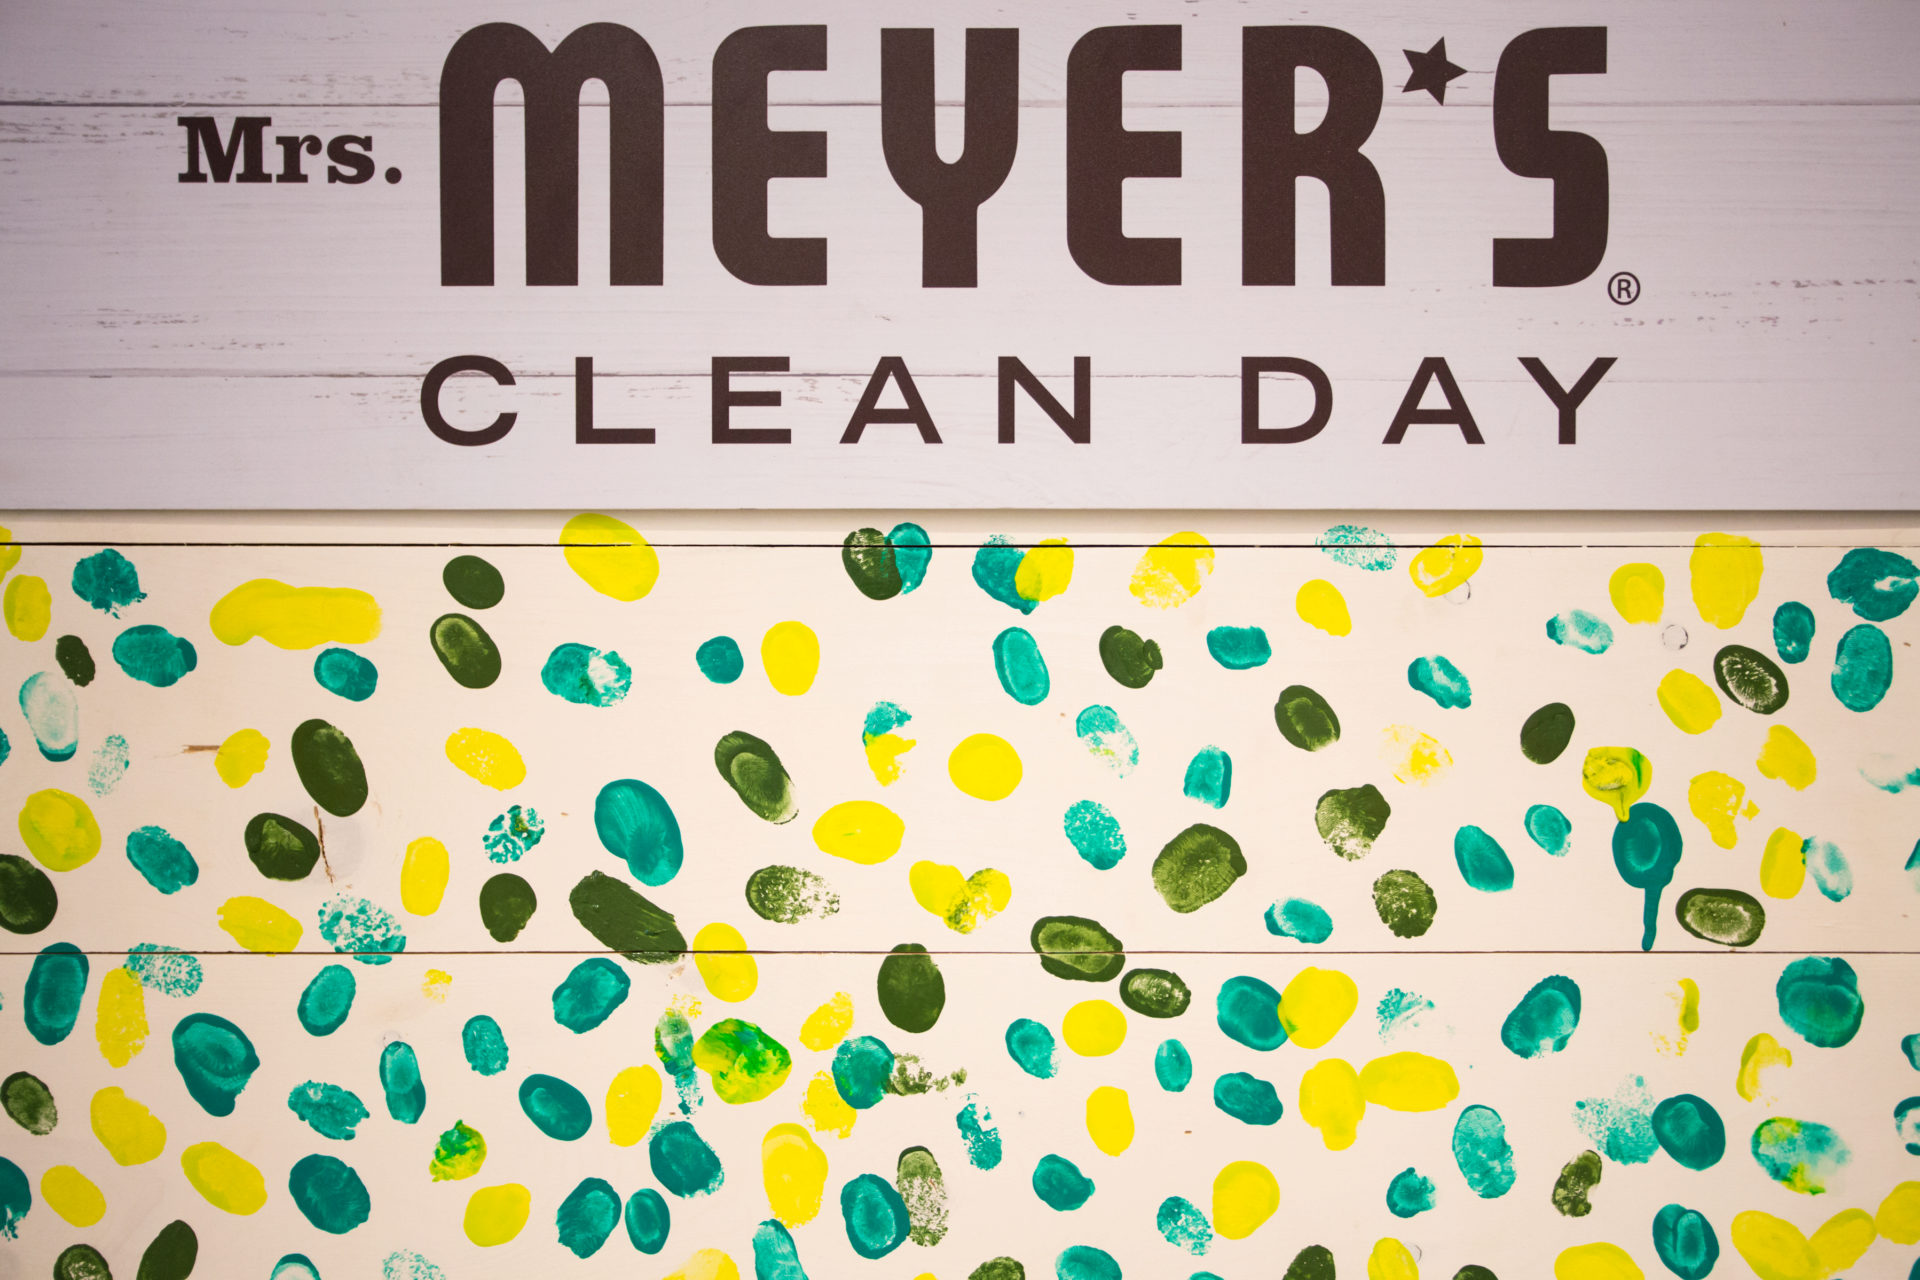 219128-Mrs.Meyers-Tour-Houston-Pledge_Wall-67.jpg